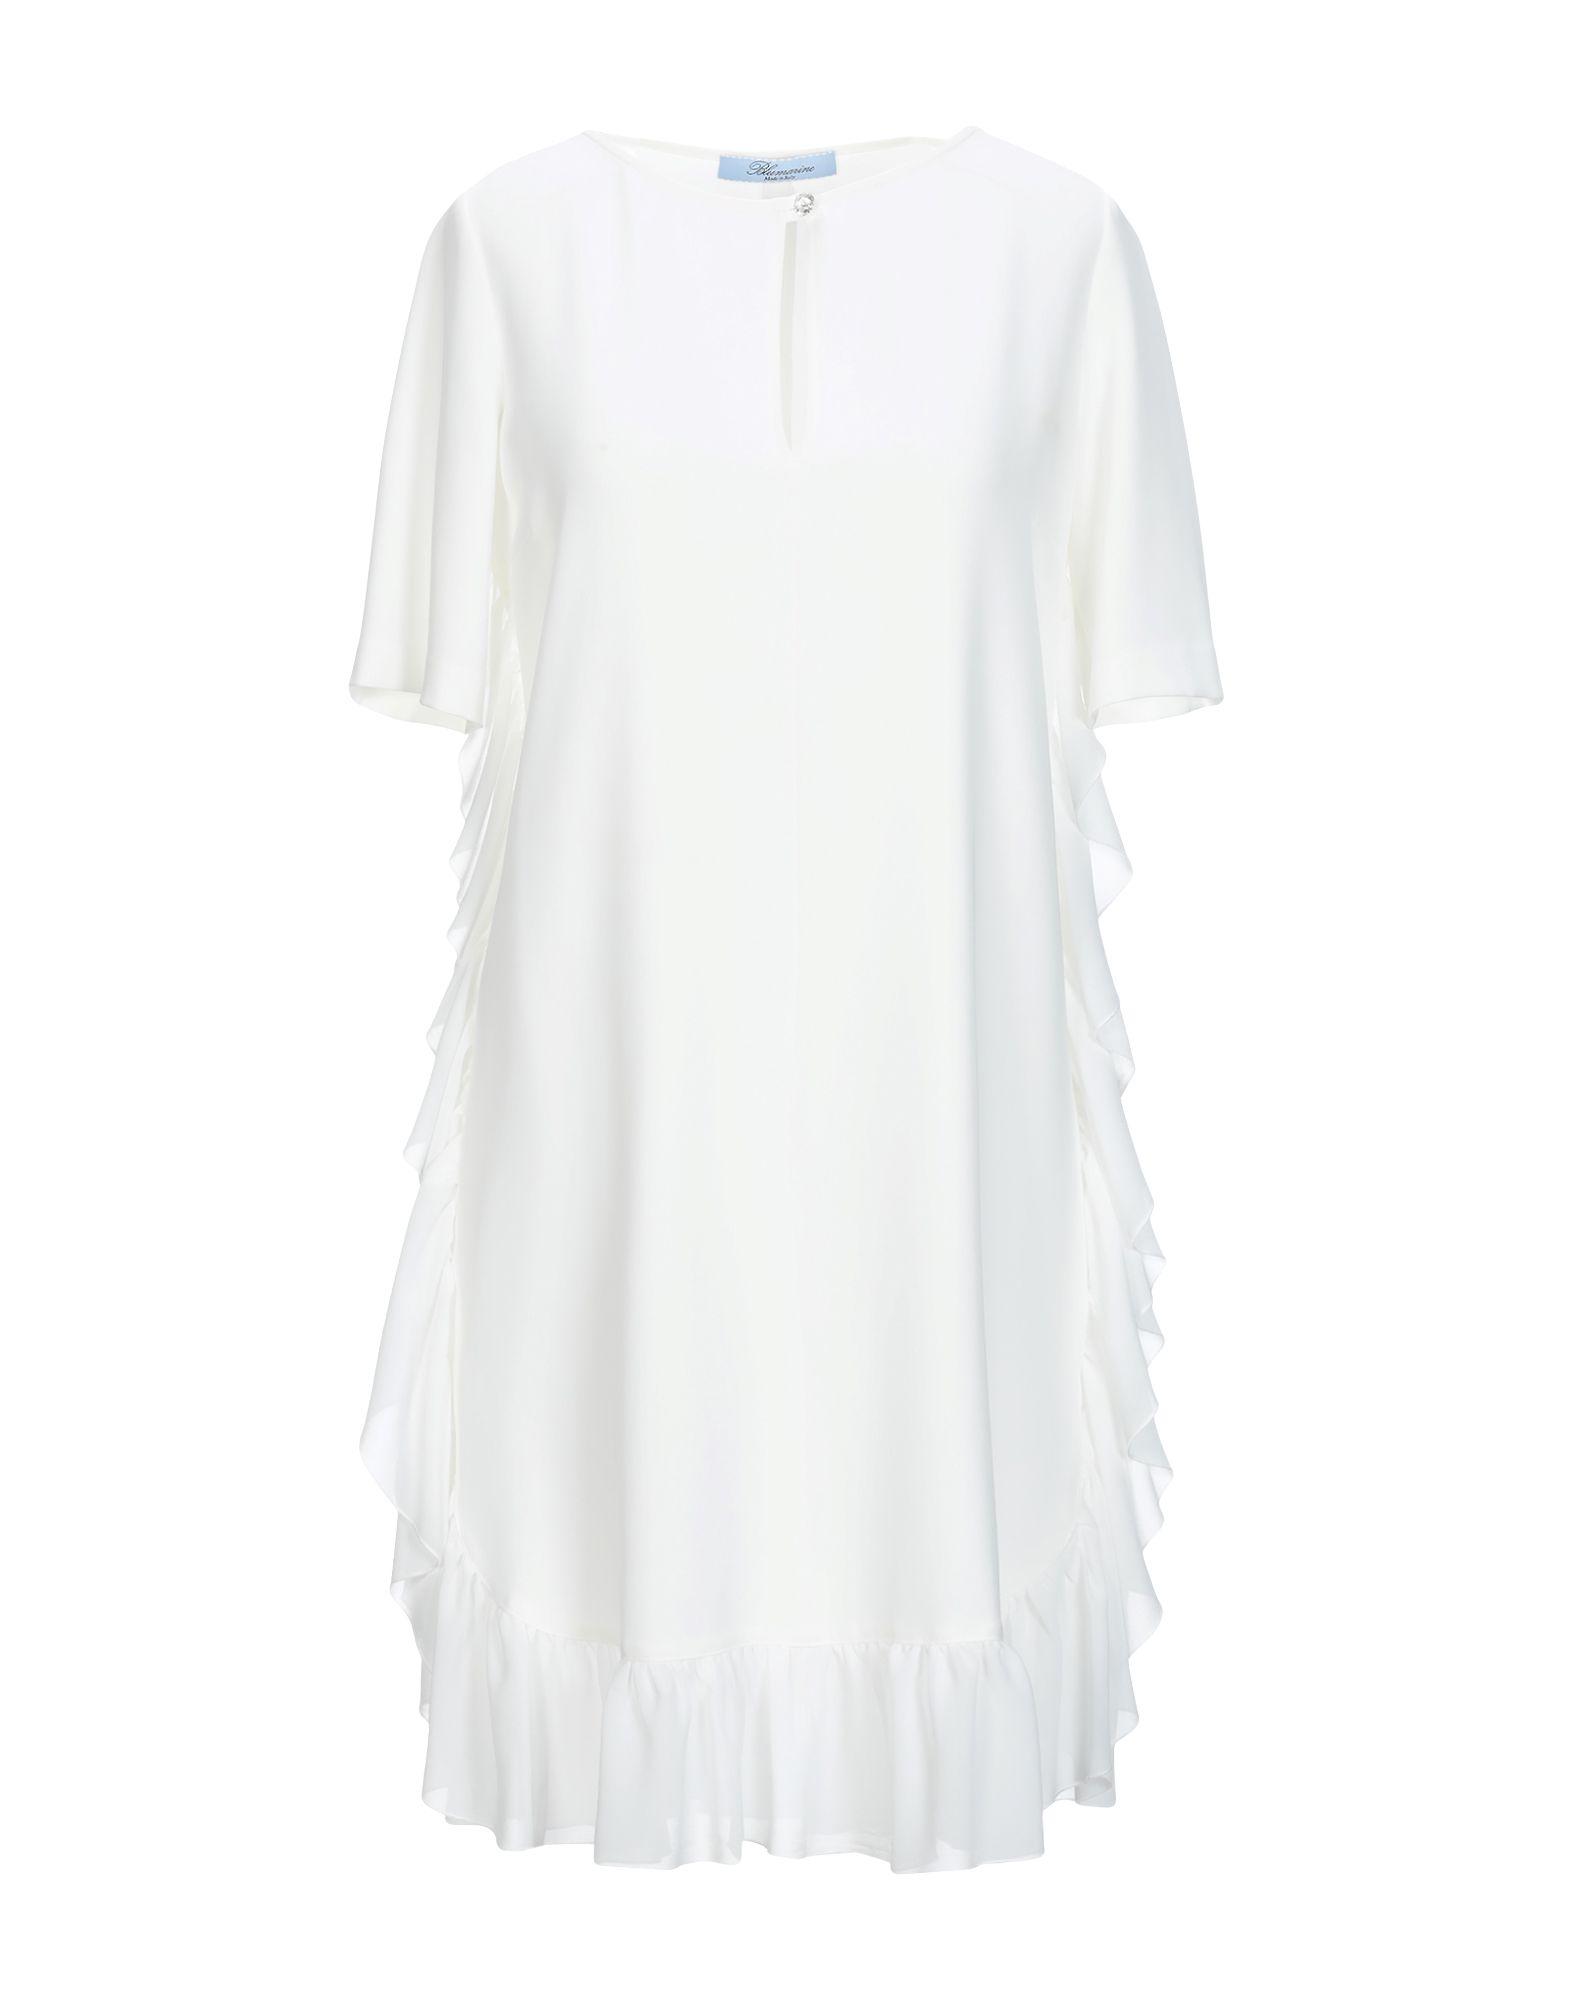 Фото - BLUMARINE Платье до колена alice san diego платье до колена